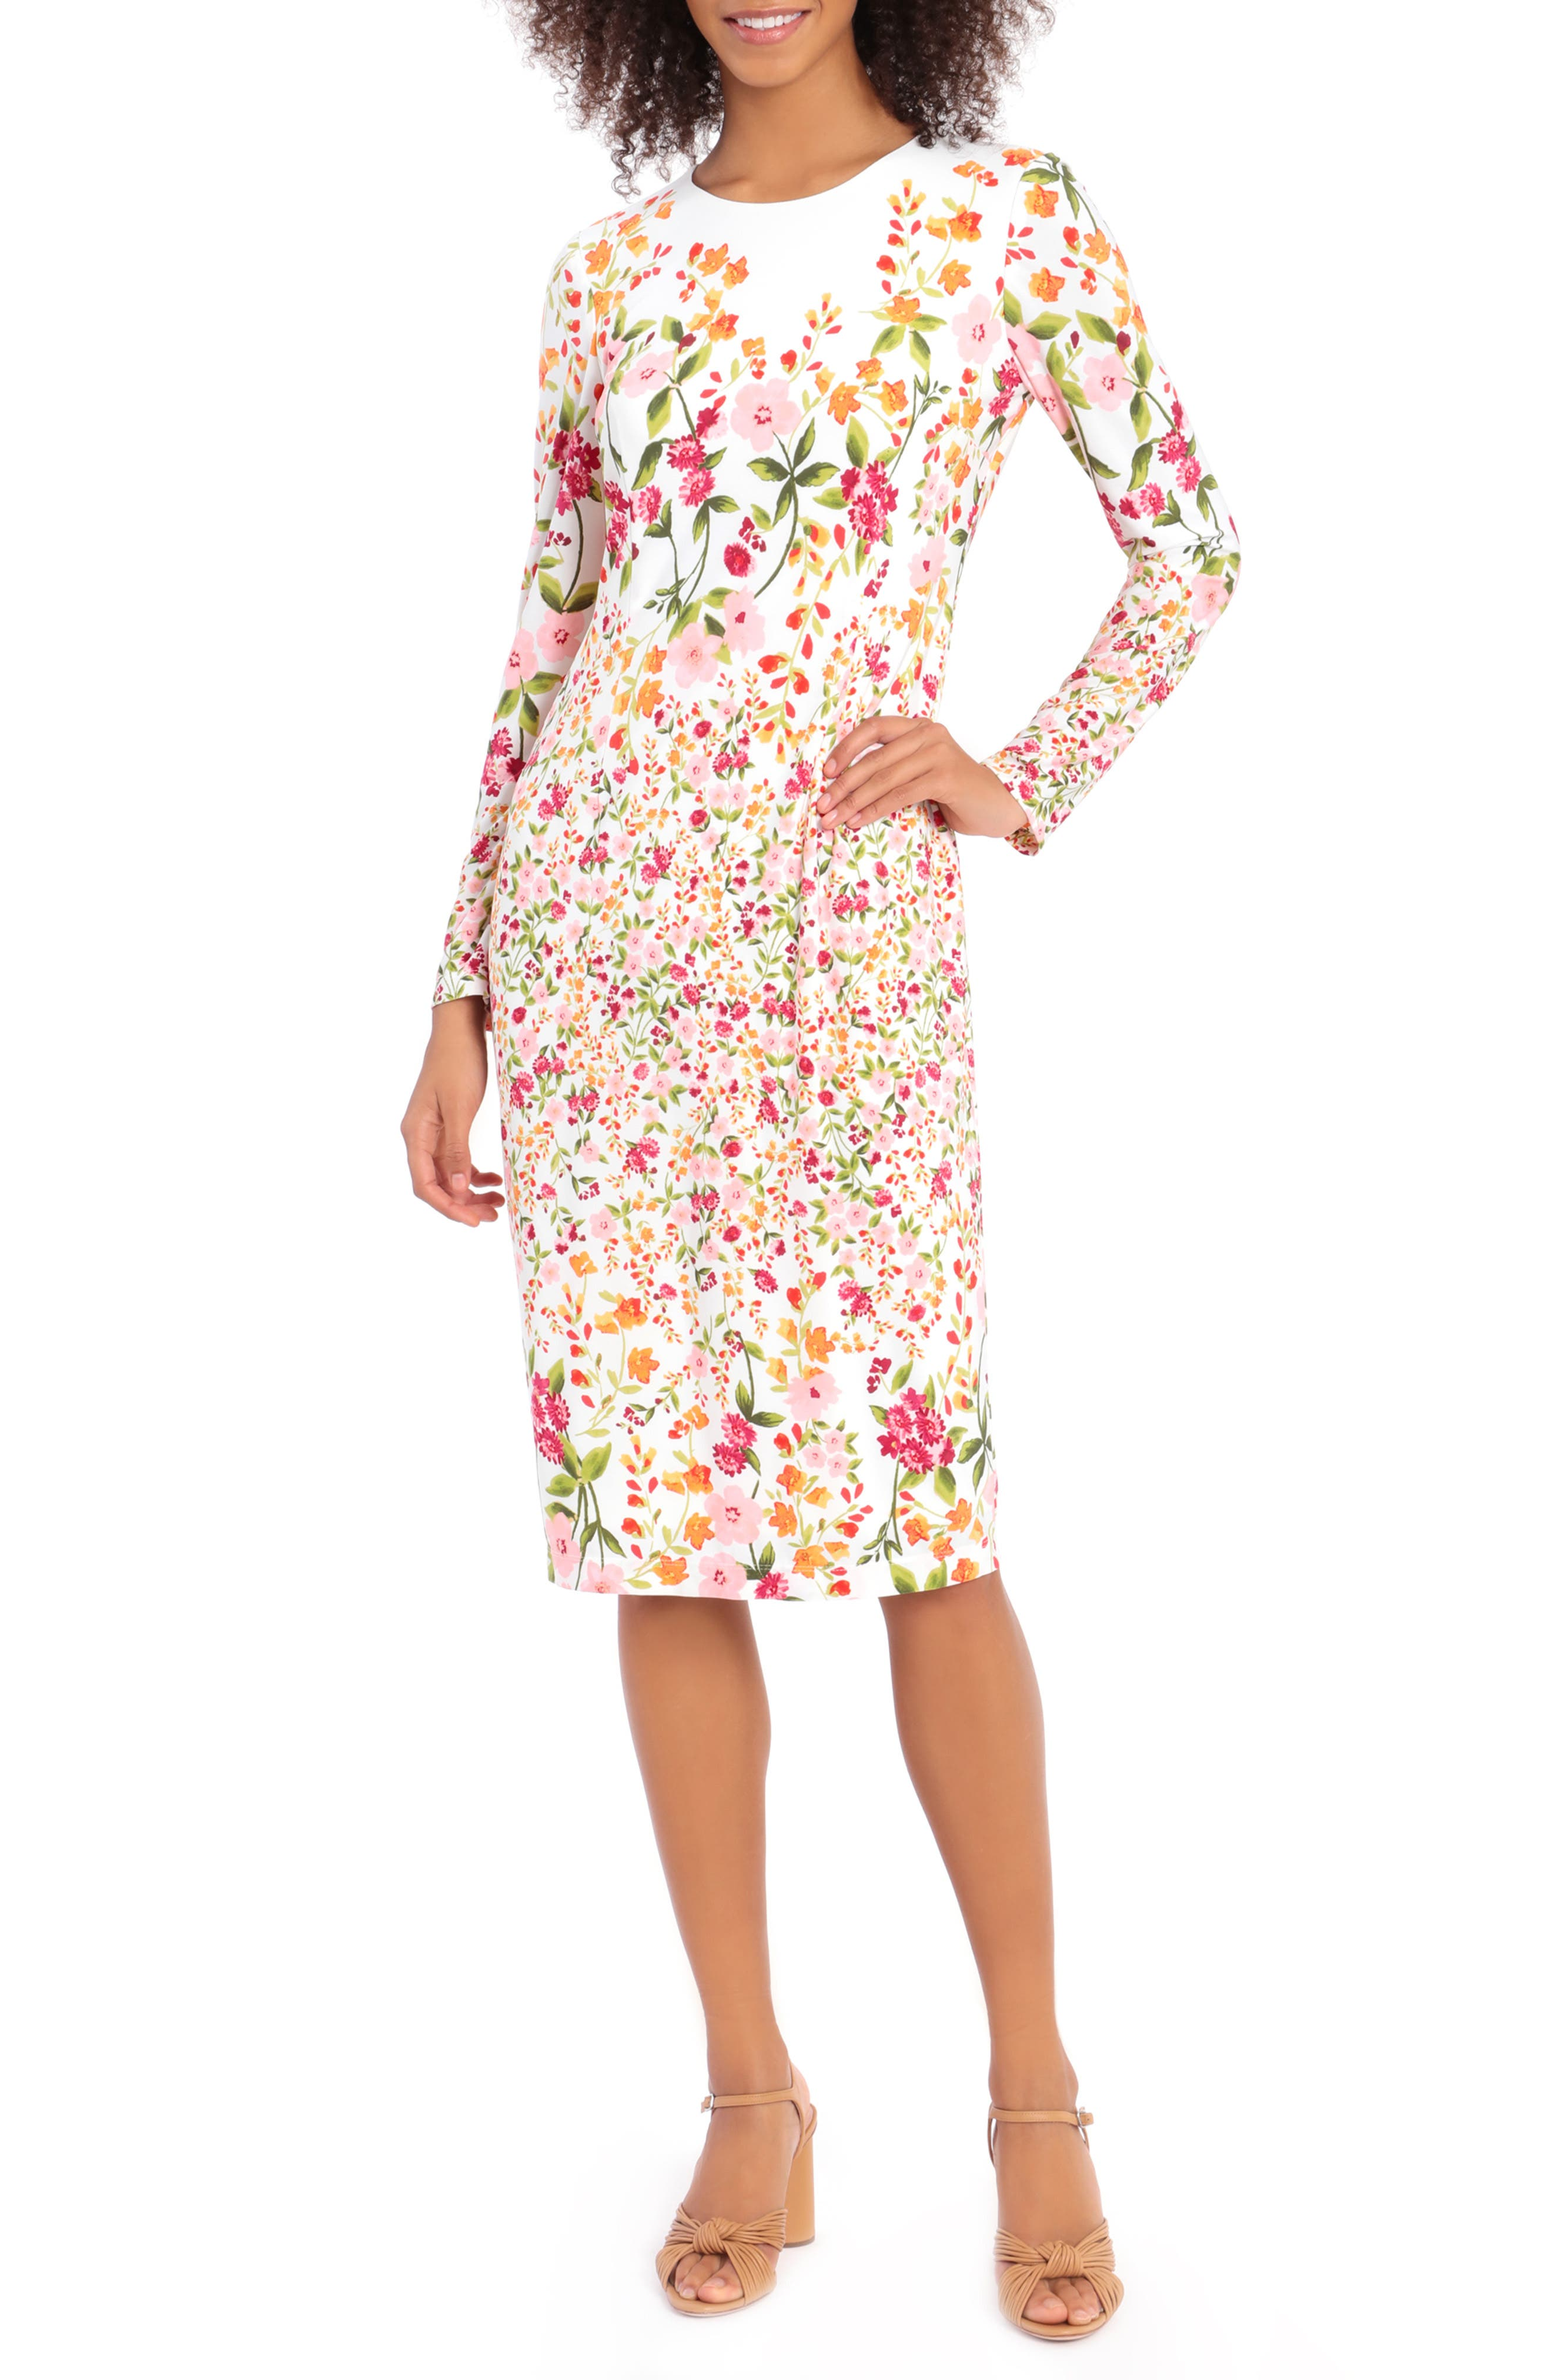 Ity Floral Long Sleeve Jersey Sheath Dress